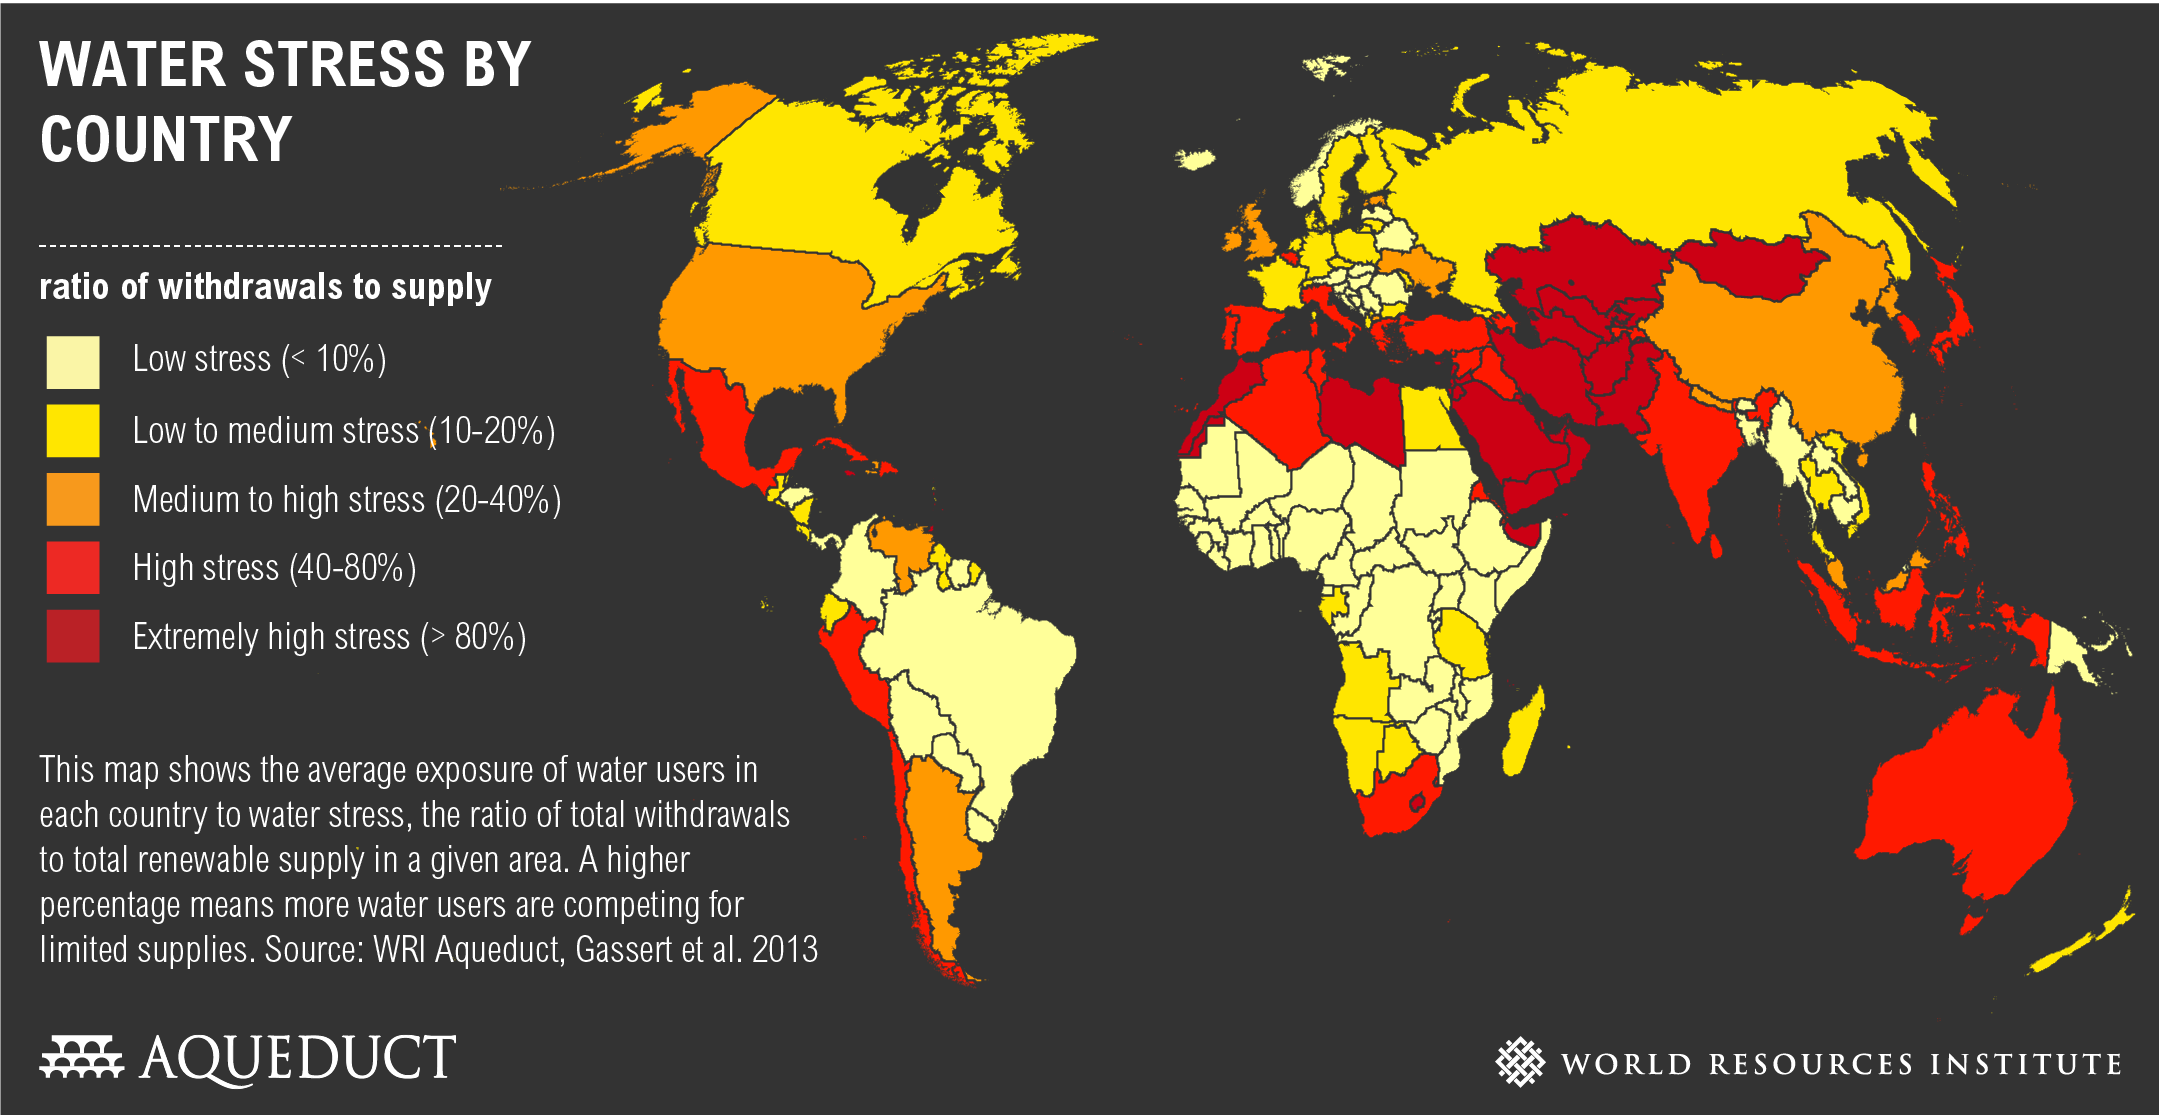 Wereldkaart met droogteproblematiek per land